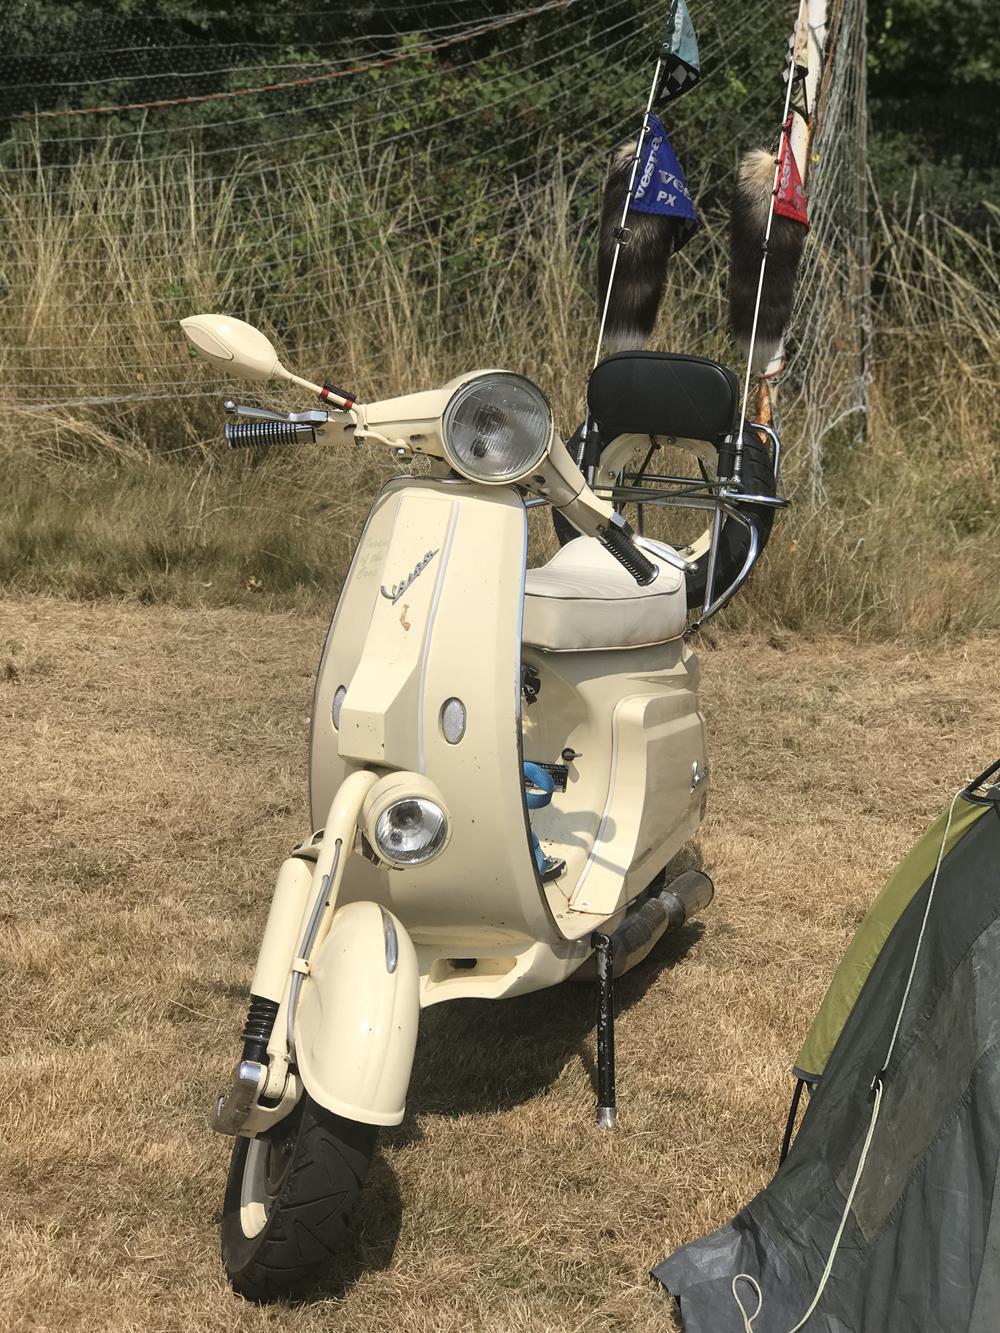 Cream Vespa chopper scooter